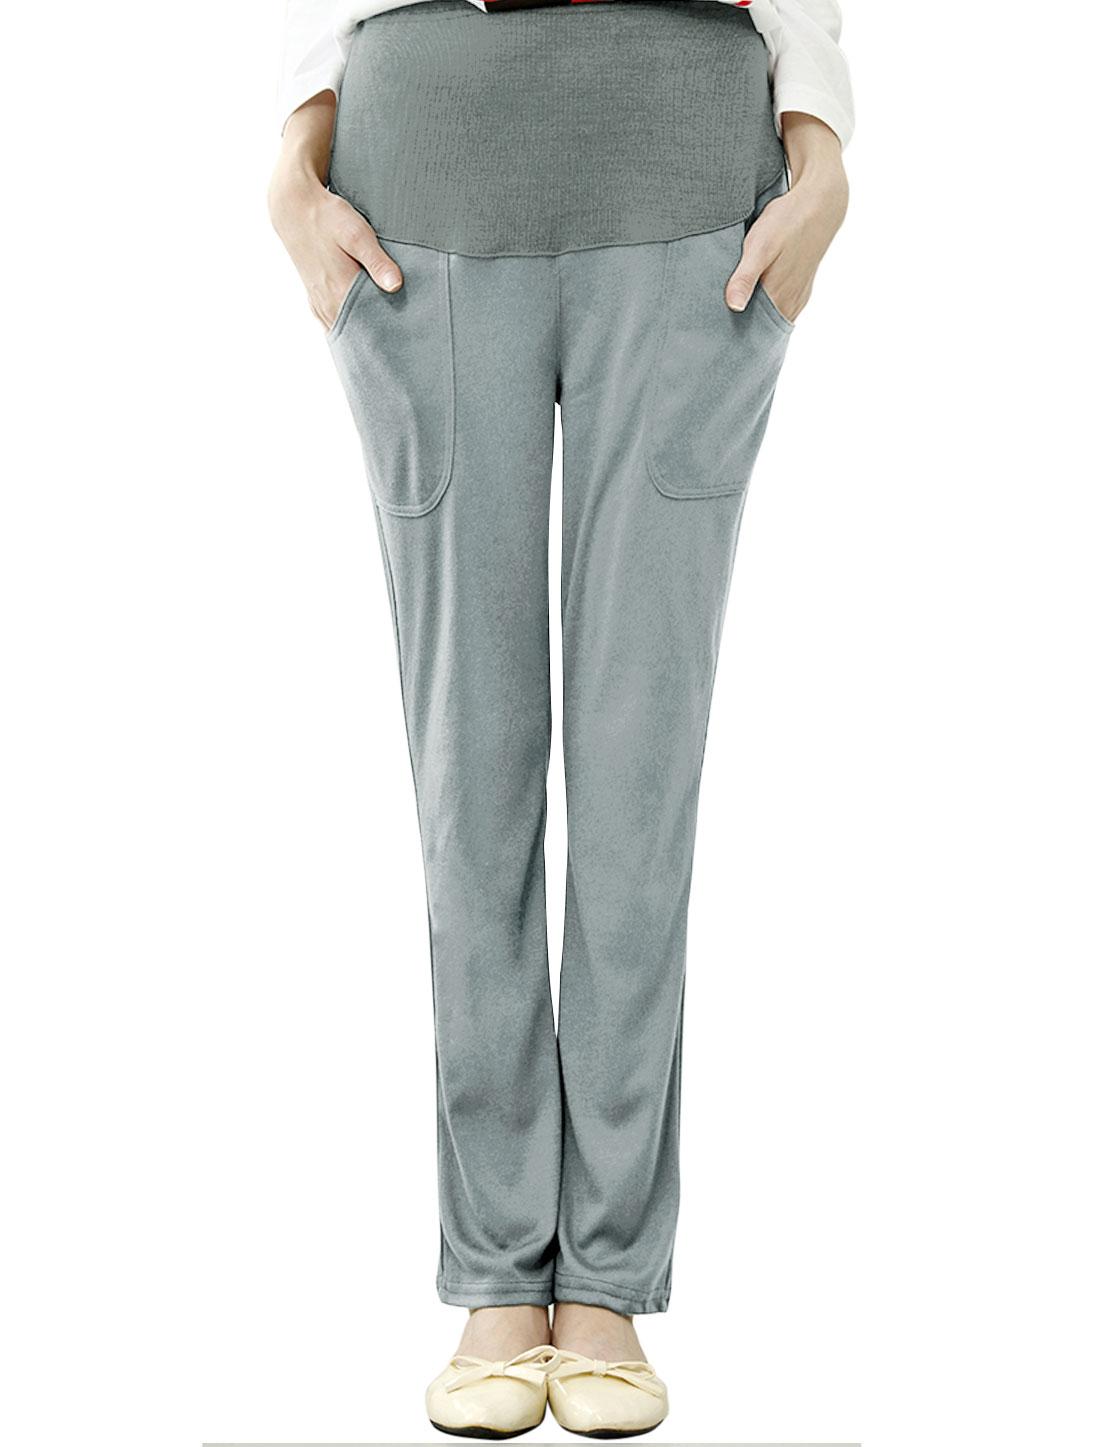 Maternity Double Slant Pockets Ribbed Front Casual Pants Light Gray XS